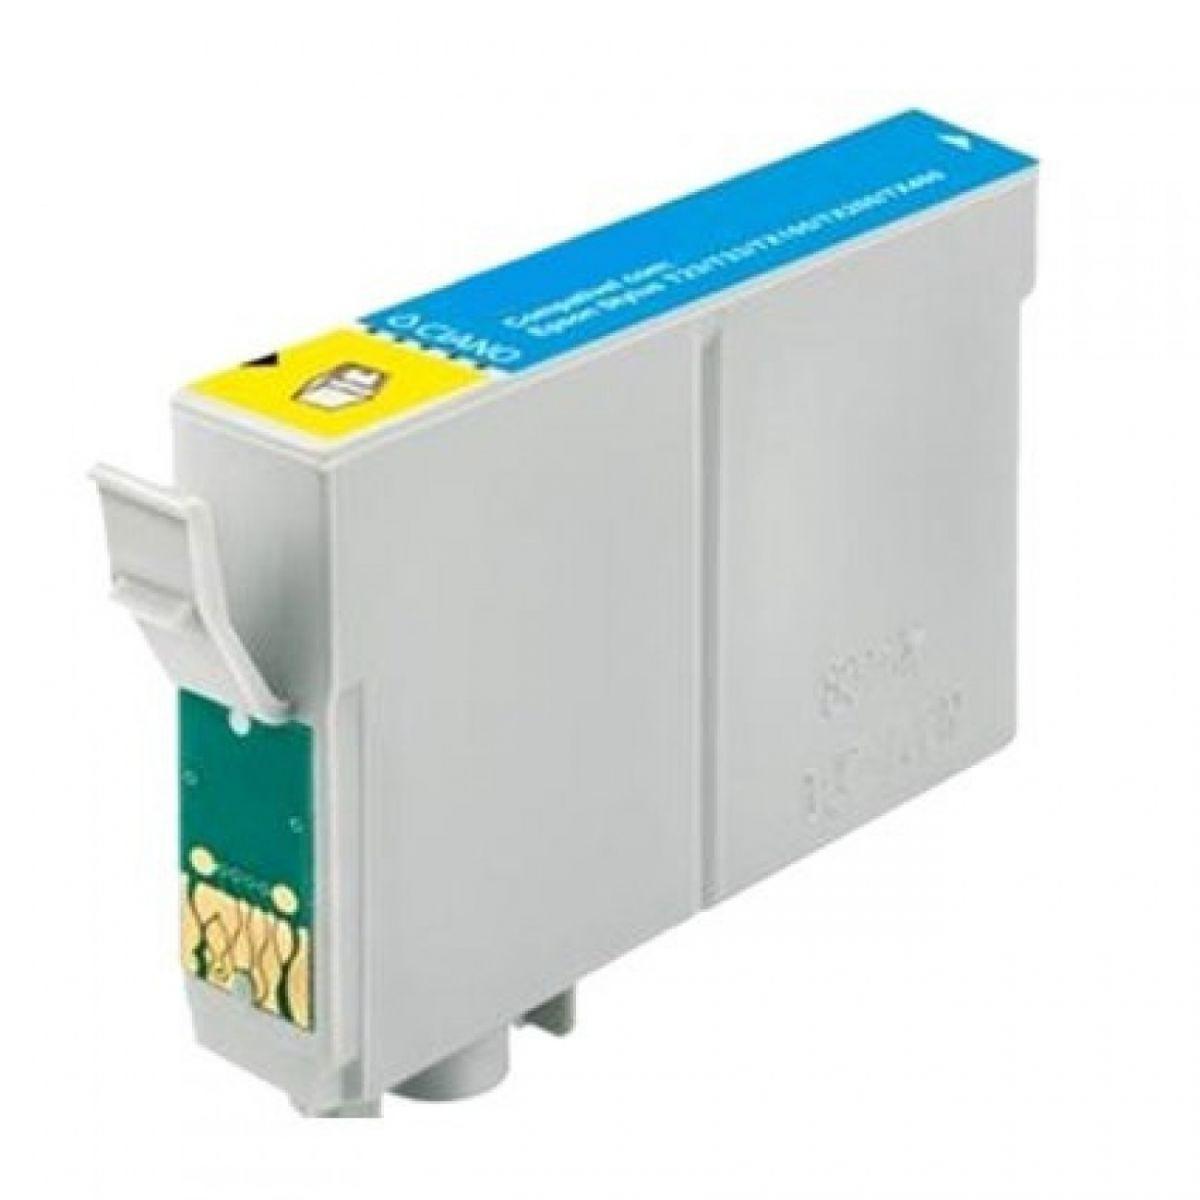 Cartucho Epson T103 T1032 T103220 azul | TX550FW TX600FW T40W T1110 | Compatível